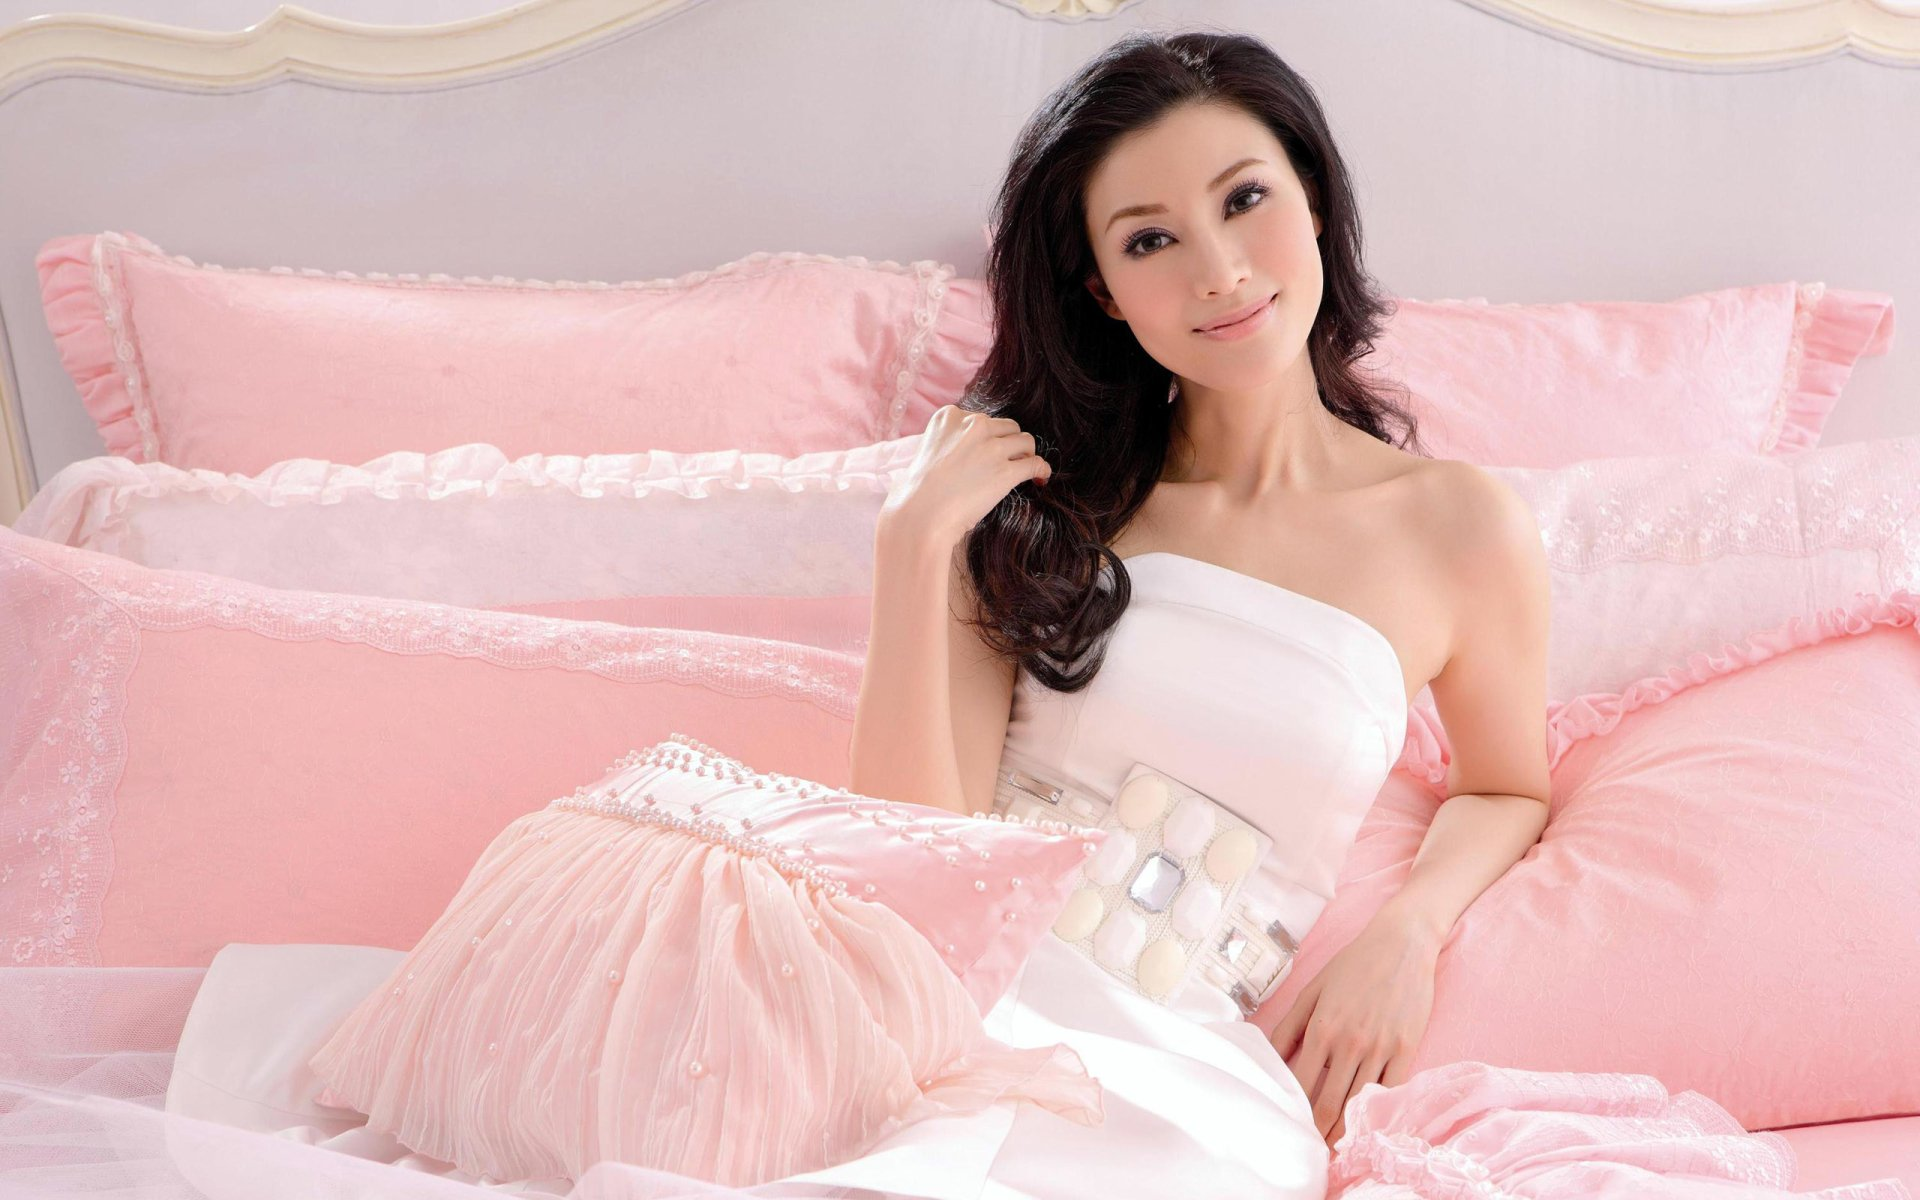 Vrouwen - Ly Gia Han  Wallpaper